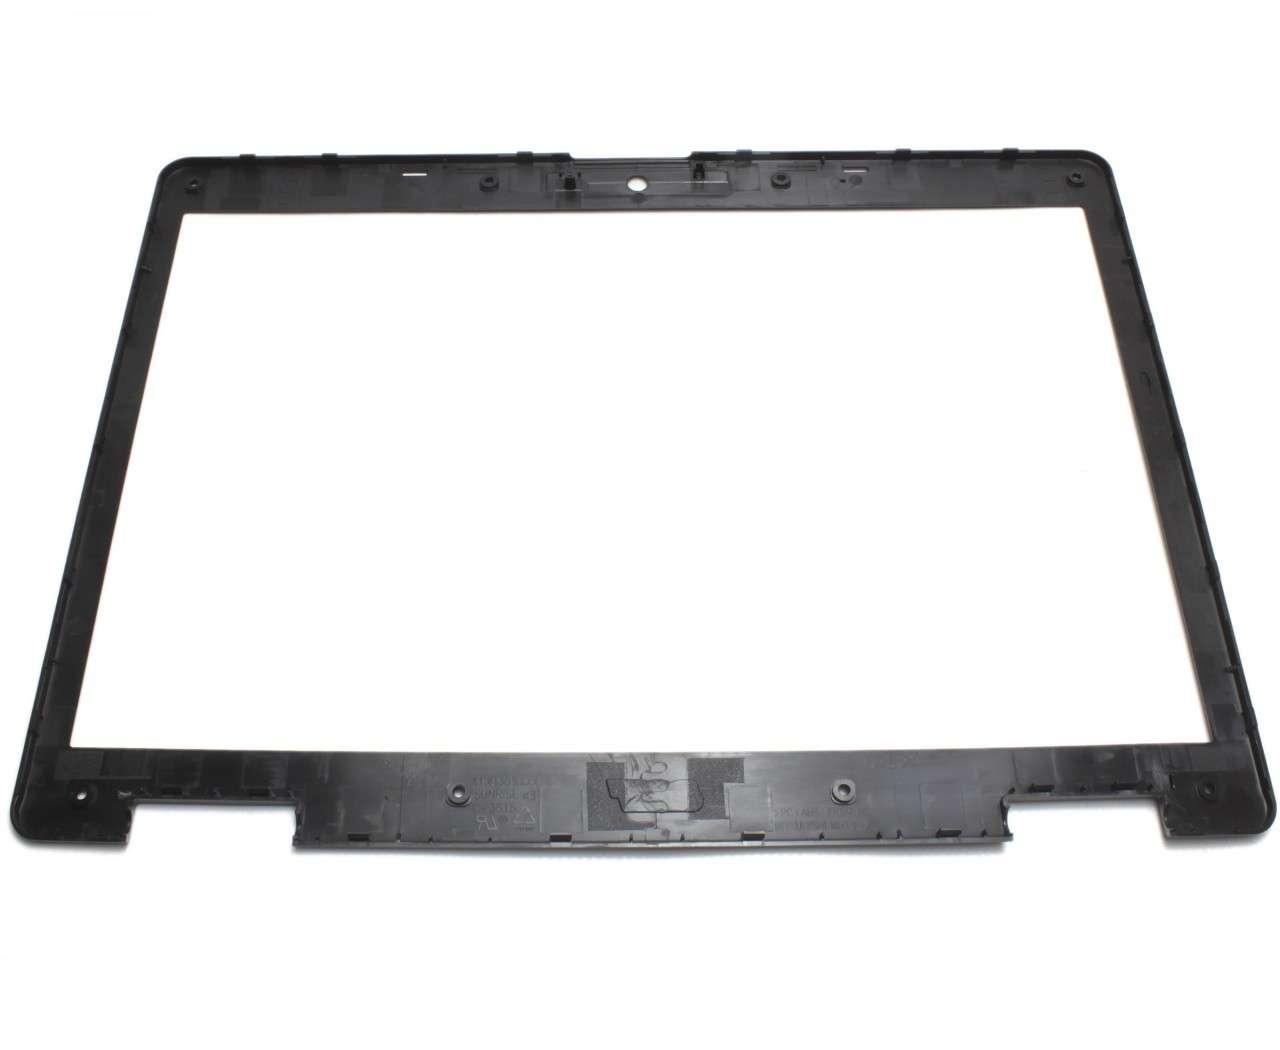 Rama Display Acer Extensa 5620z Bezel Front Cover Neagra imagine